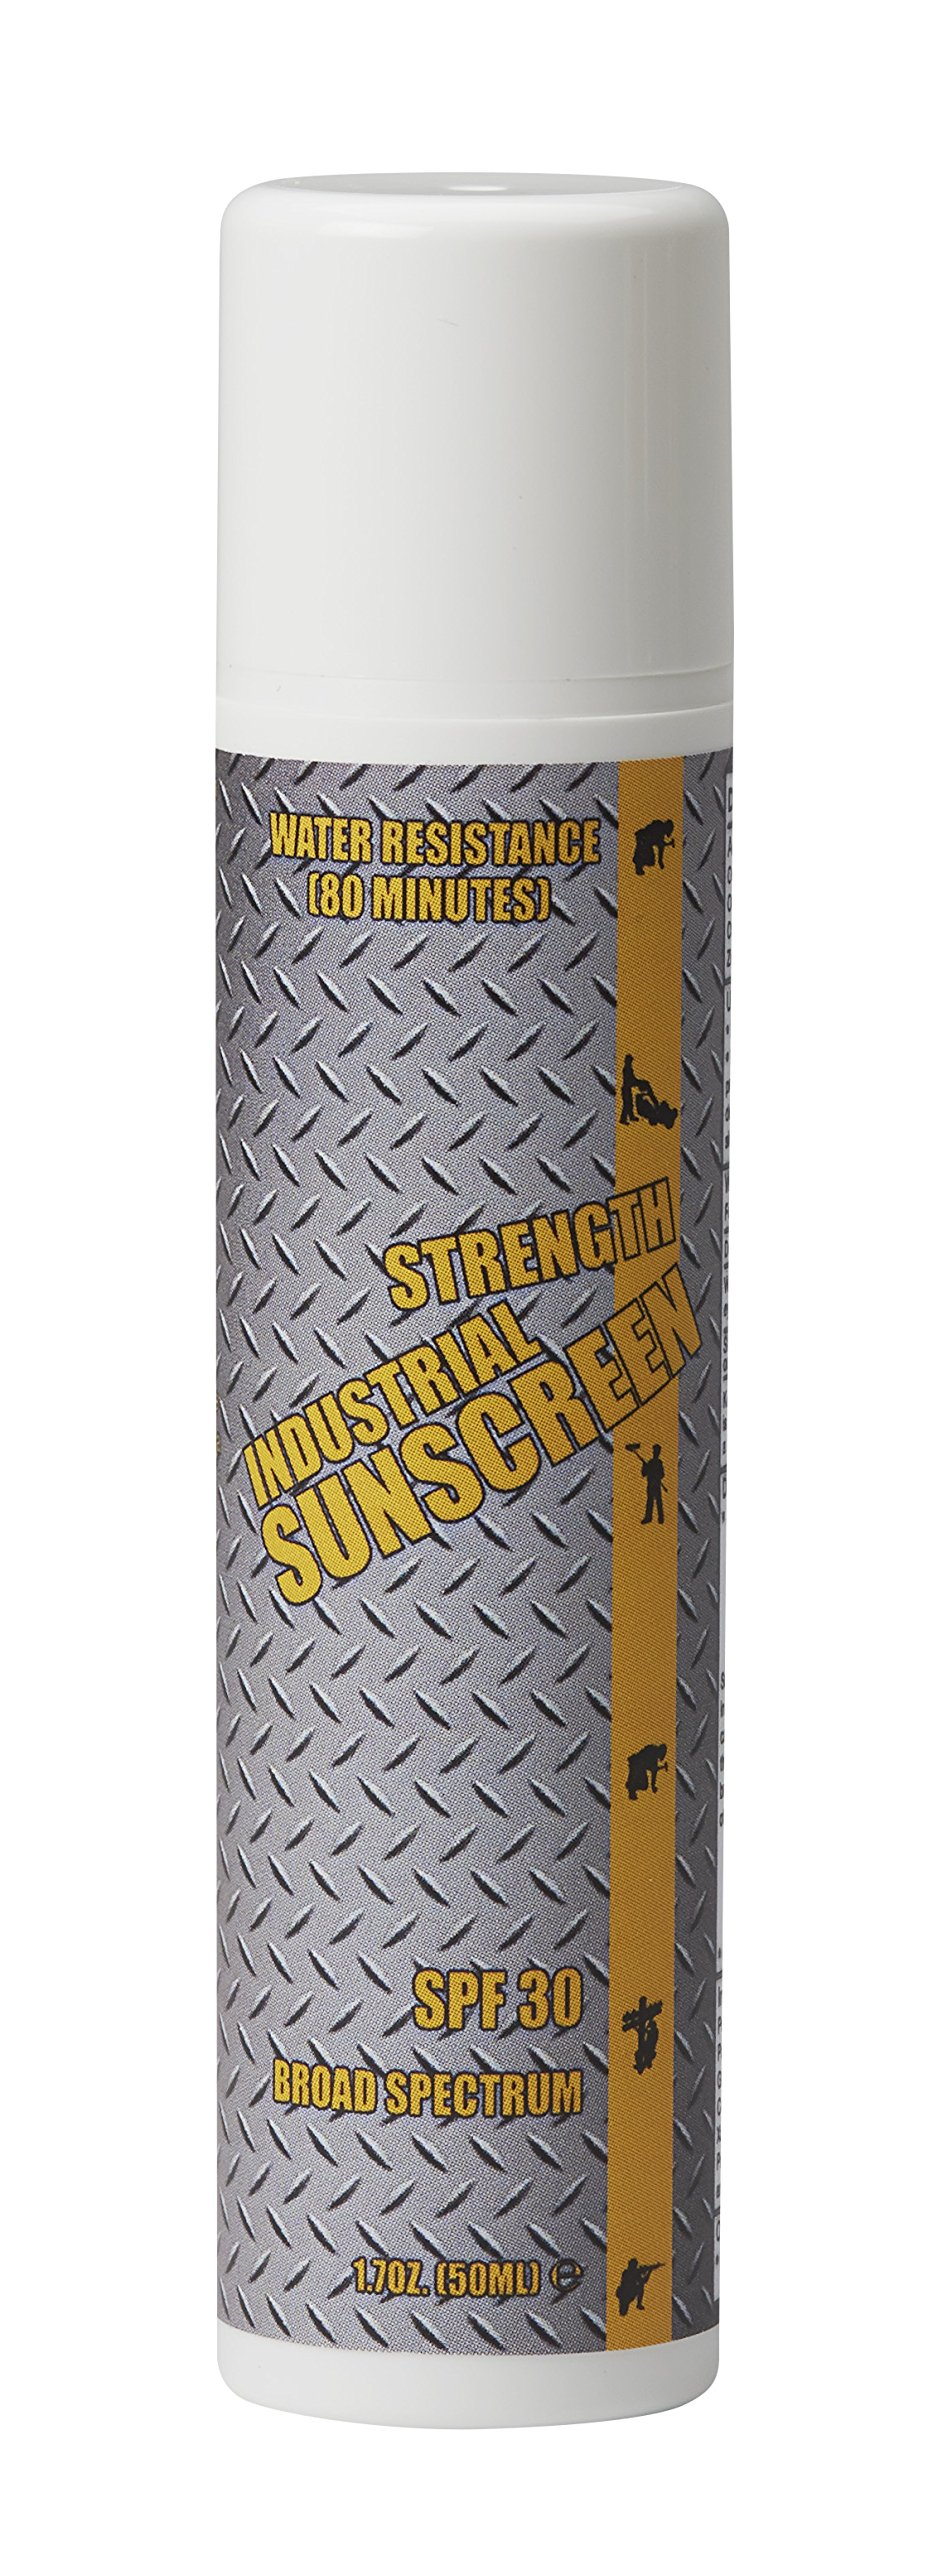 Industrial Sunscreen SPF30+ Broad Spectrum 80 Min. Water Resistance Zinc Oxide Formulation 50 Ml.